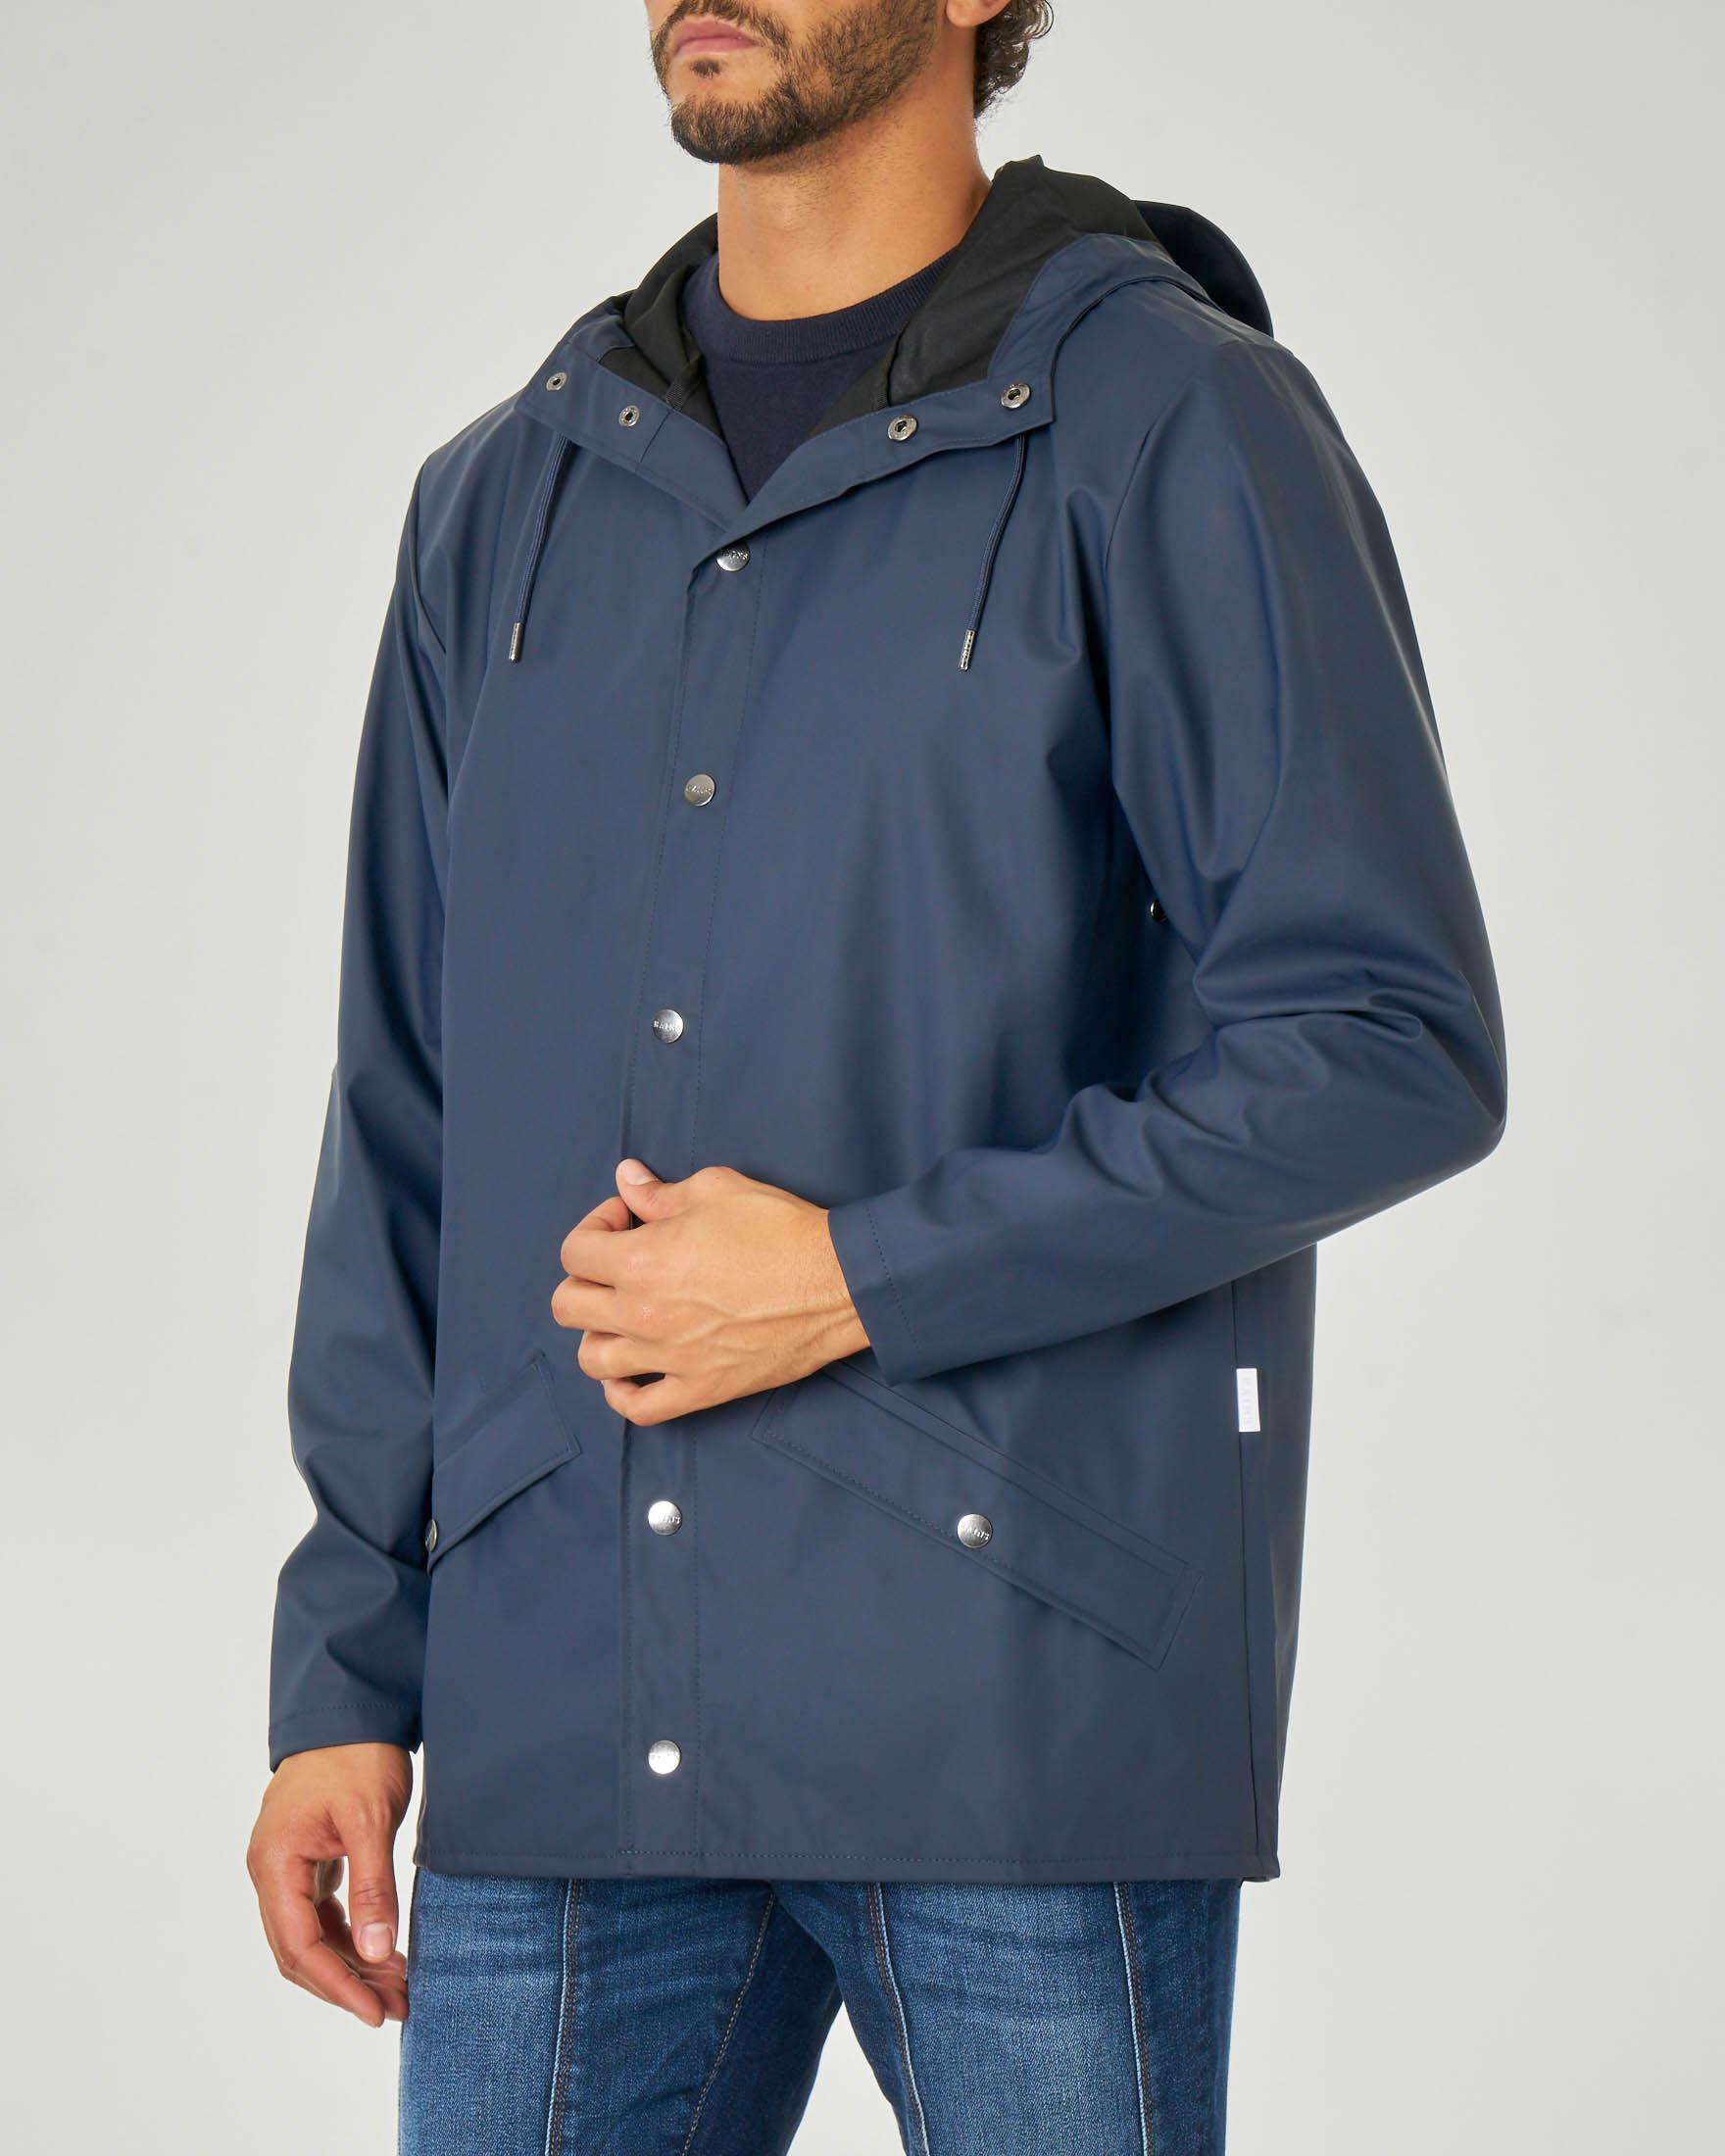 Impermeabile Jacket blu